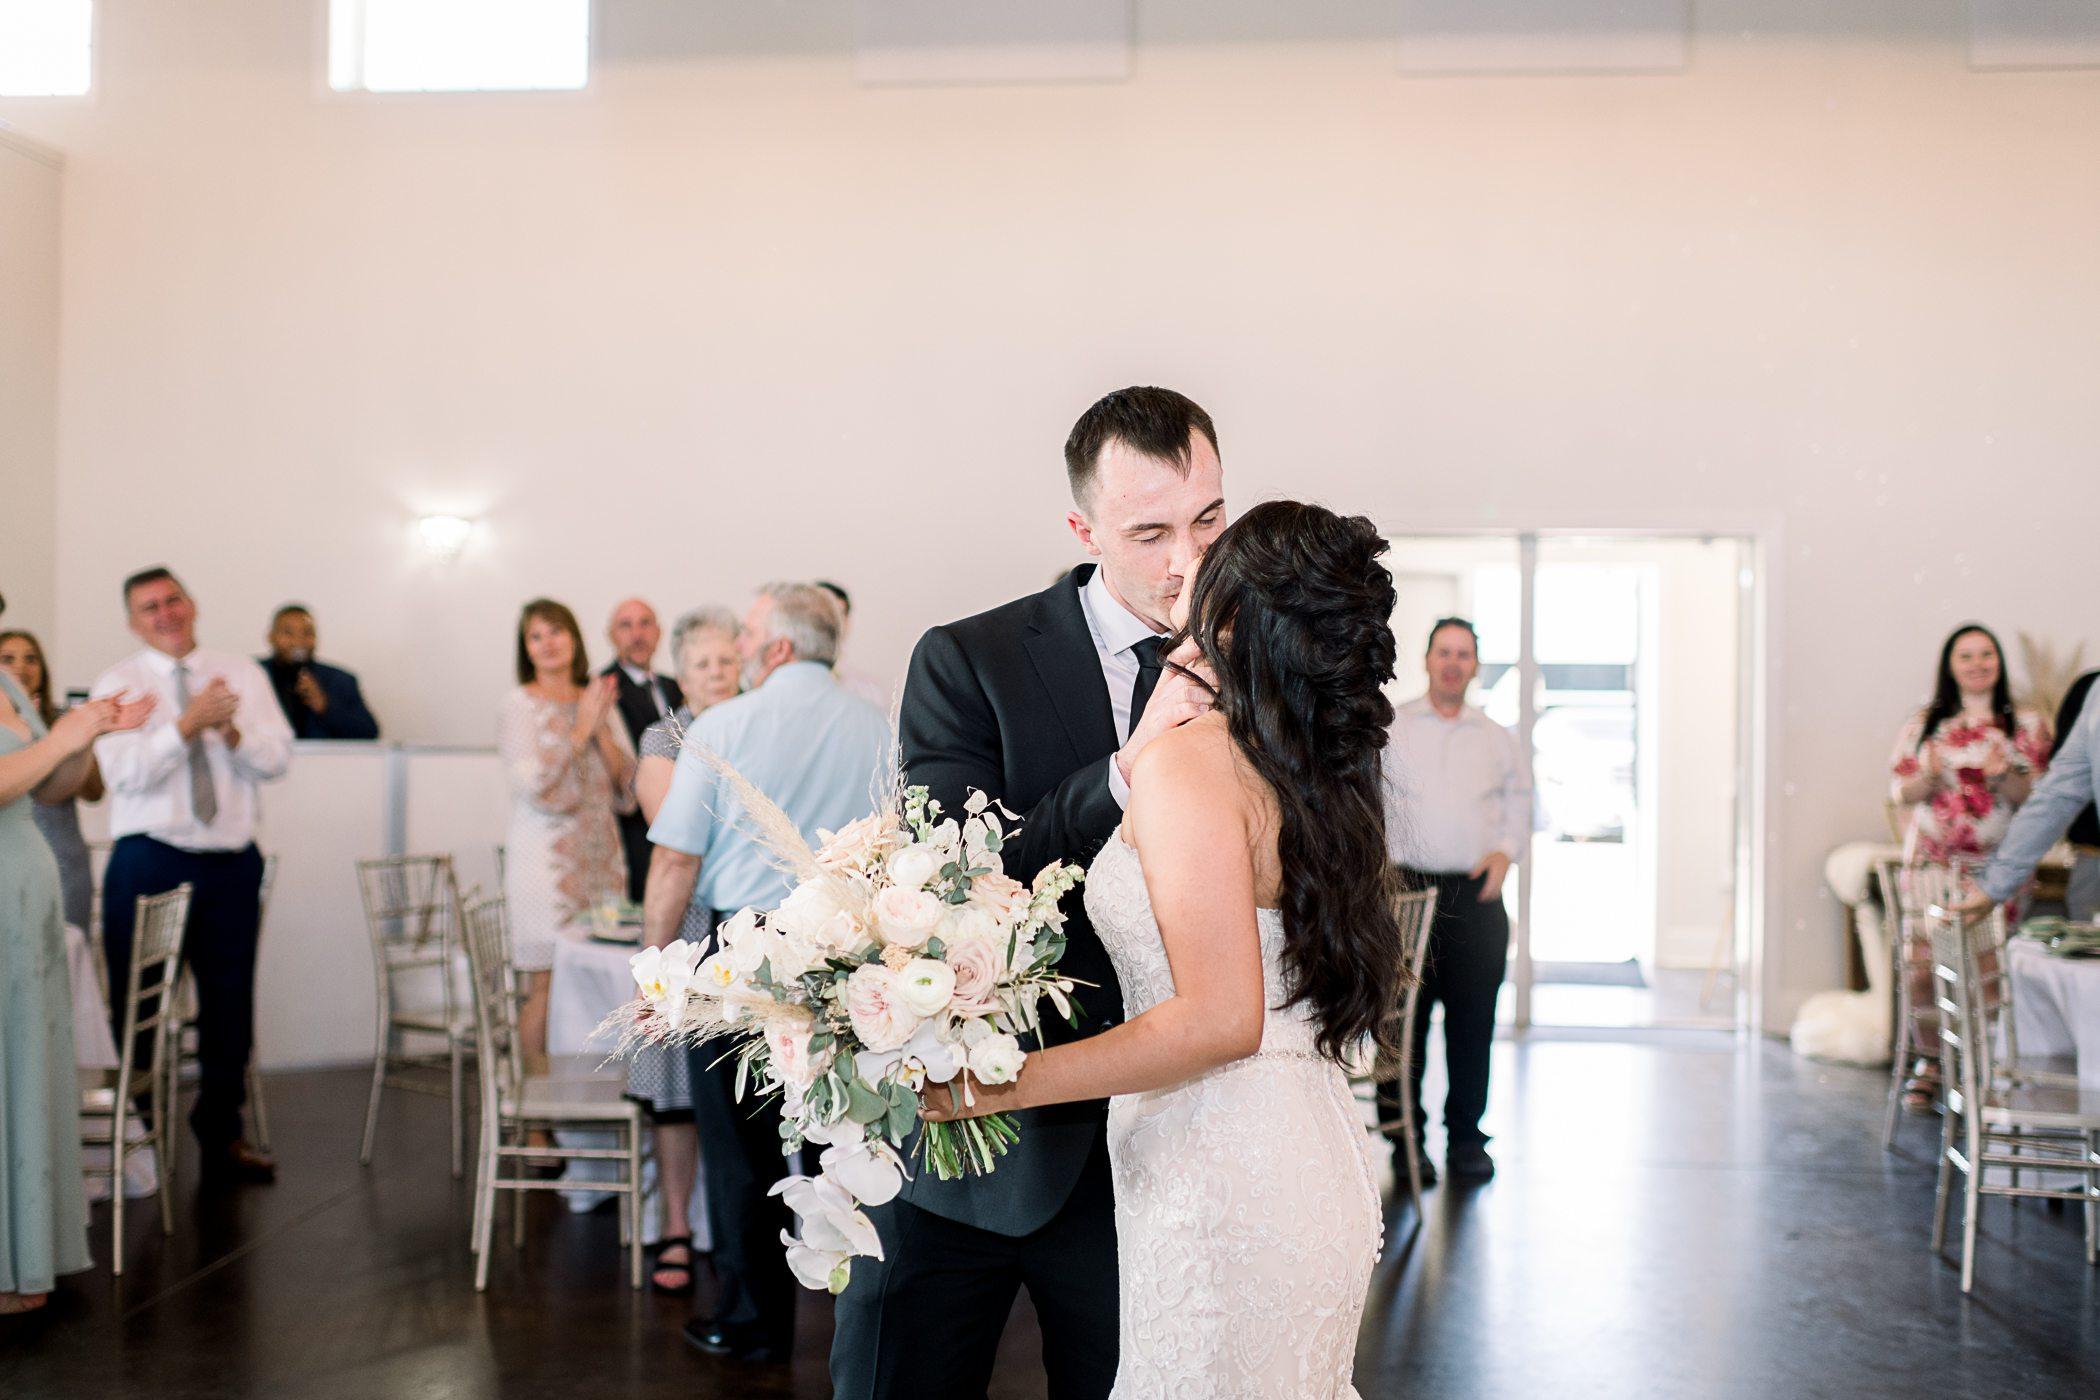 The Twisted Tulip Wedding Photographers